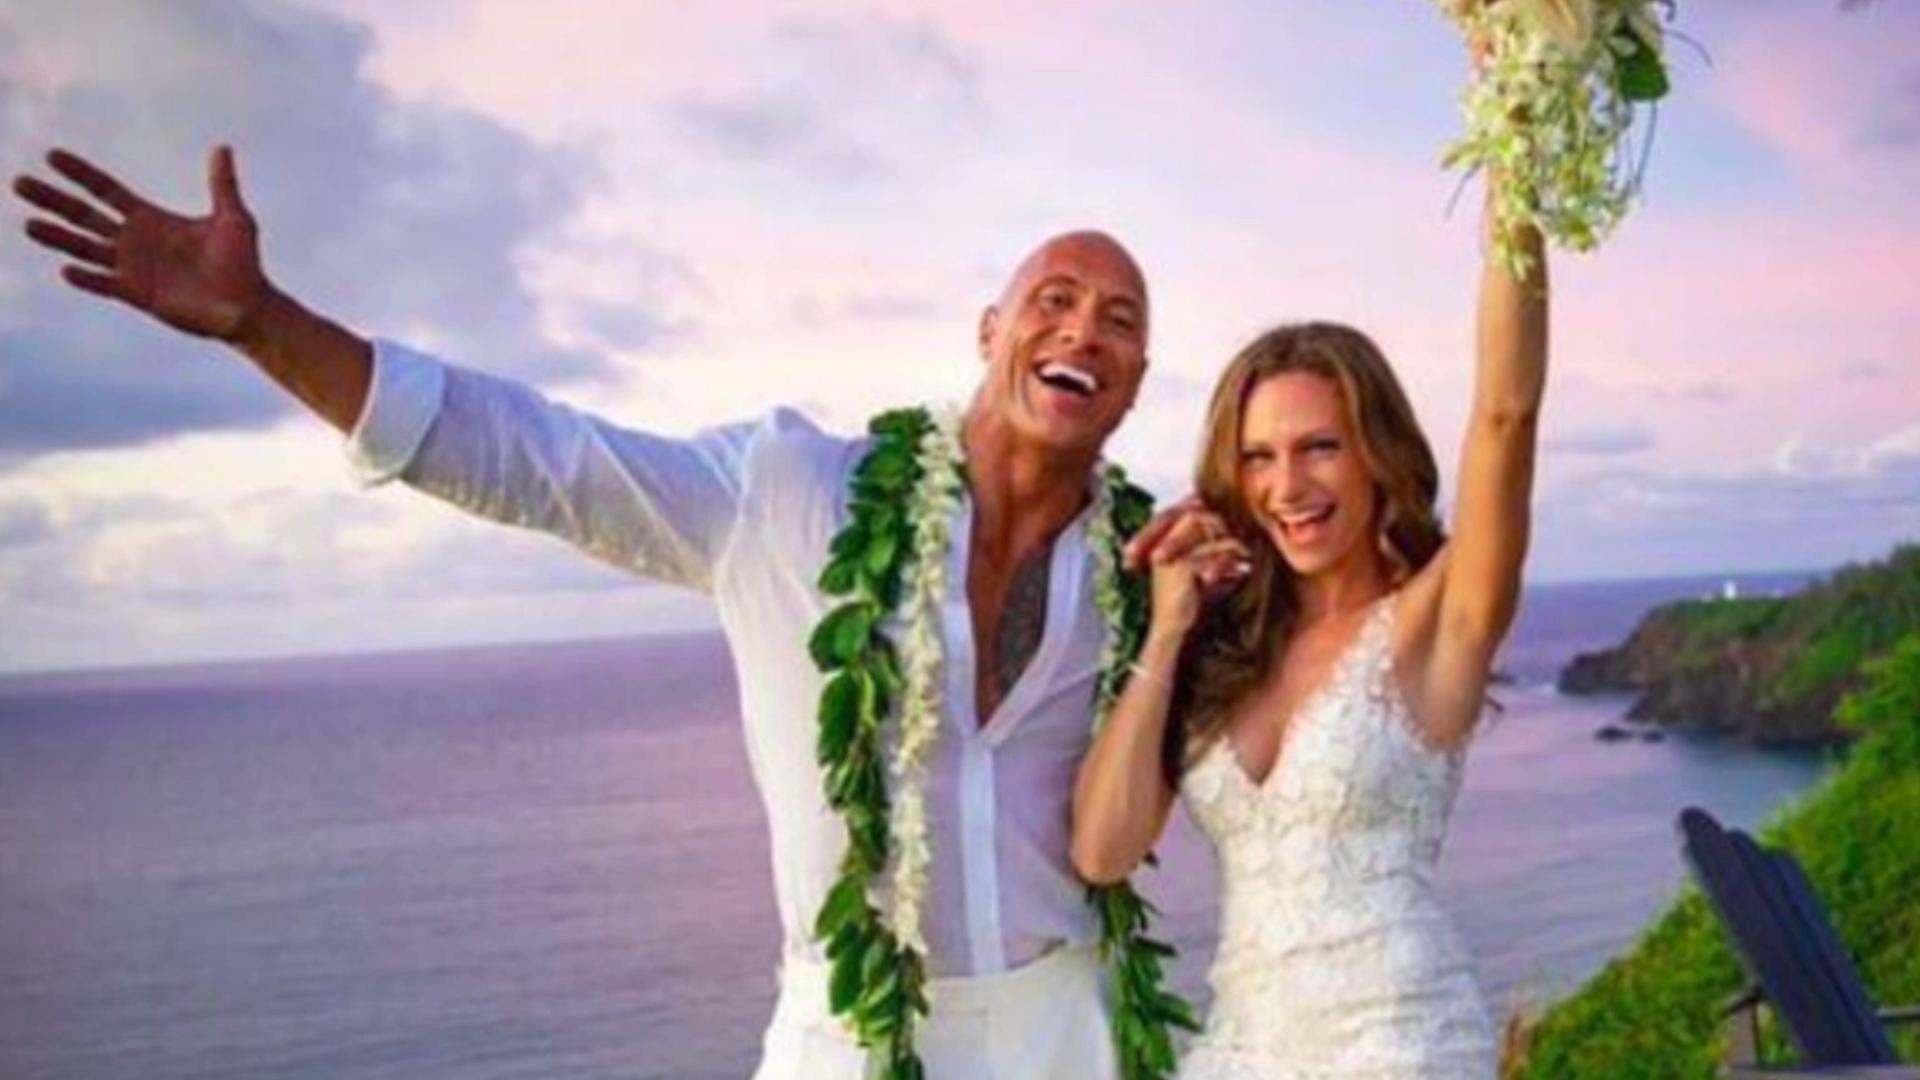 Dwayne 'The Rock' Johnson Marries Partner Lauren Hashian In Hawaii